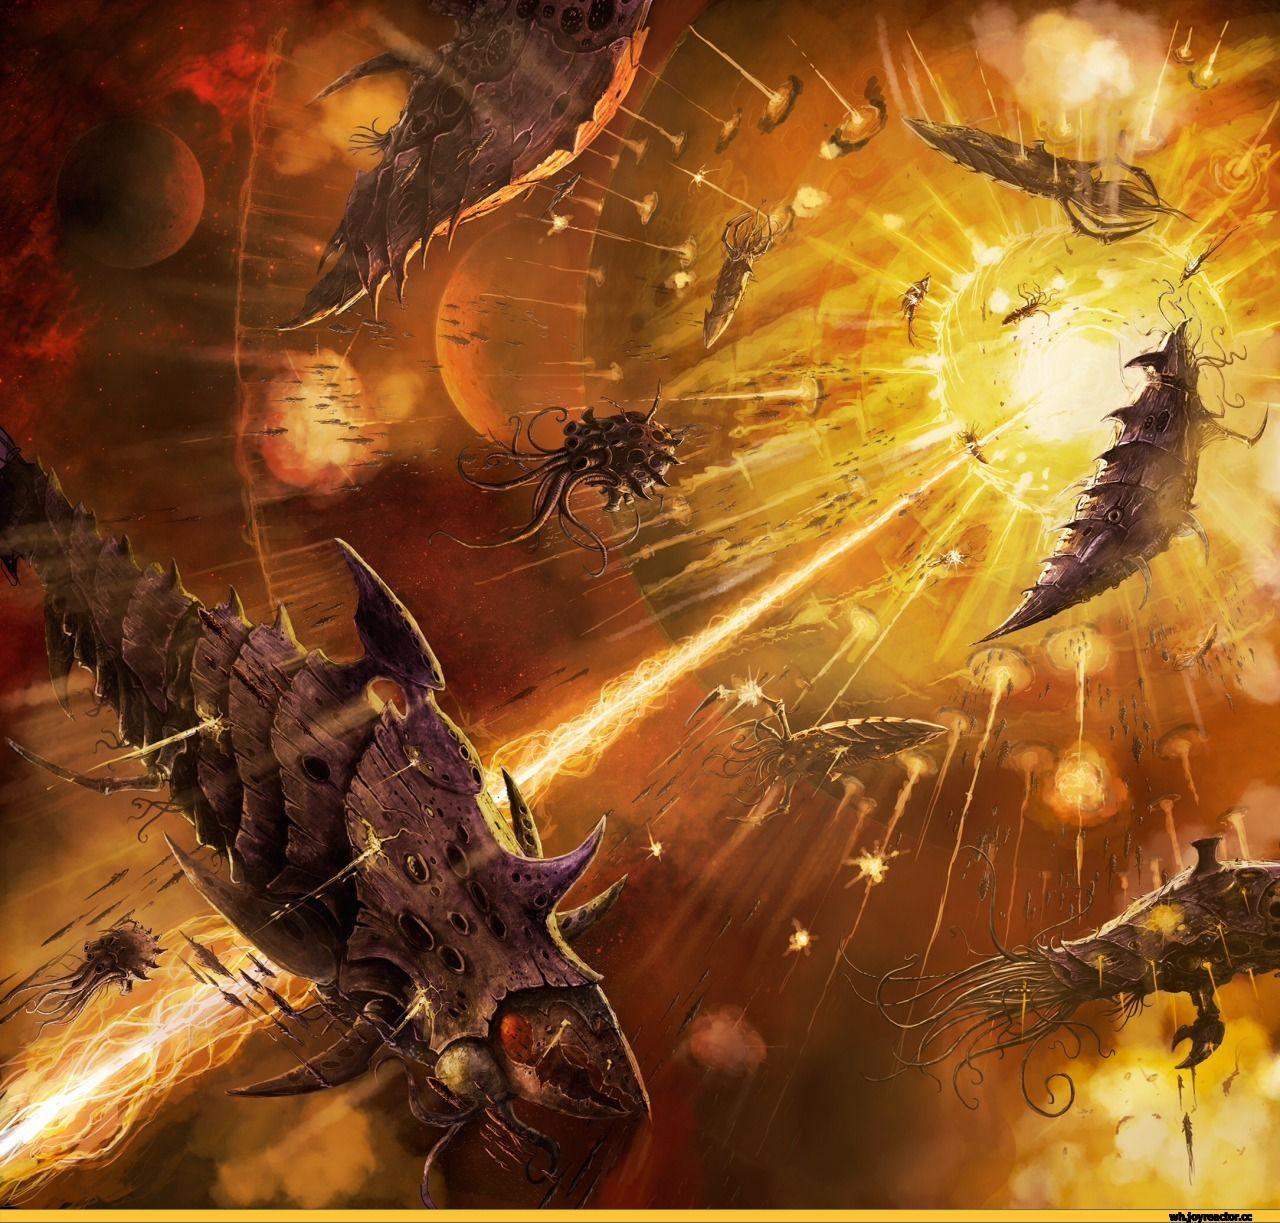 warhammer 40000,фэндомы,tyranids,wh starship | Warhammer 40k tyranids, Tyranids, Warhammer art